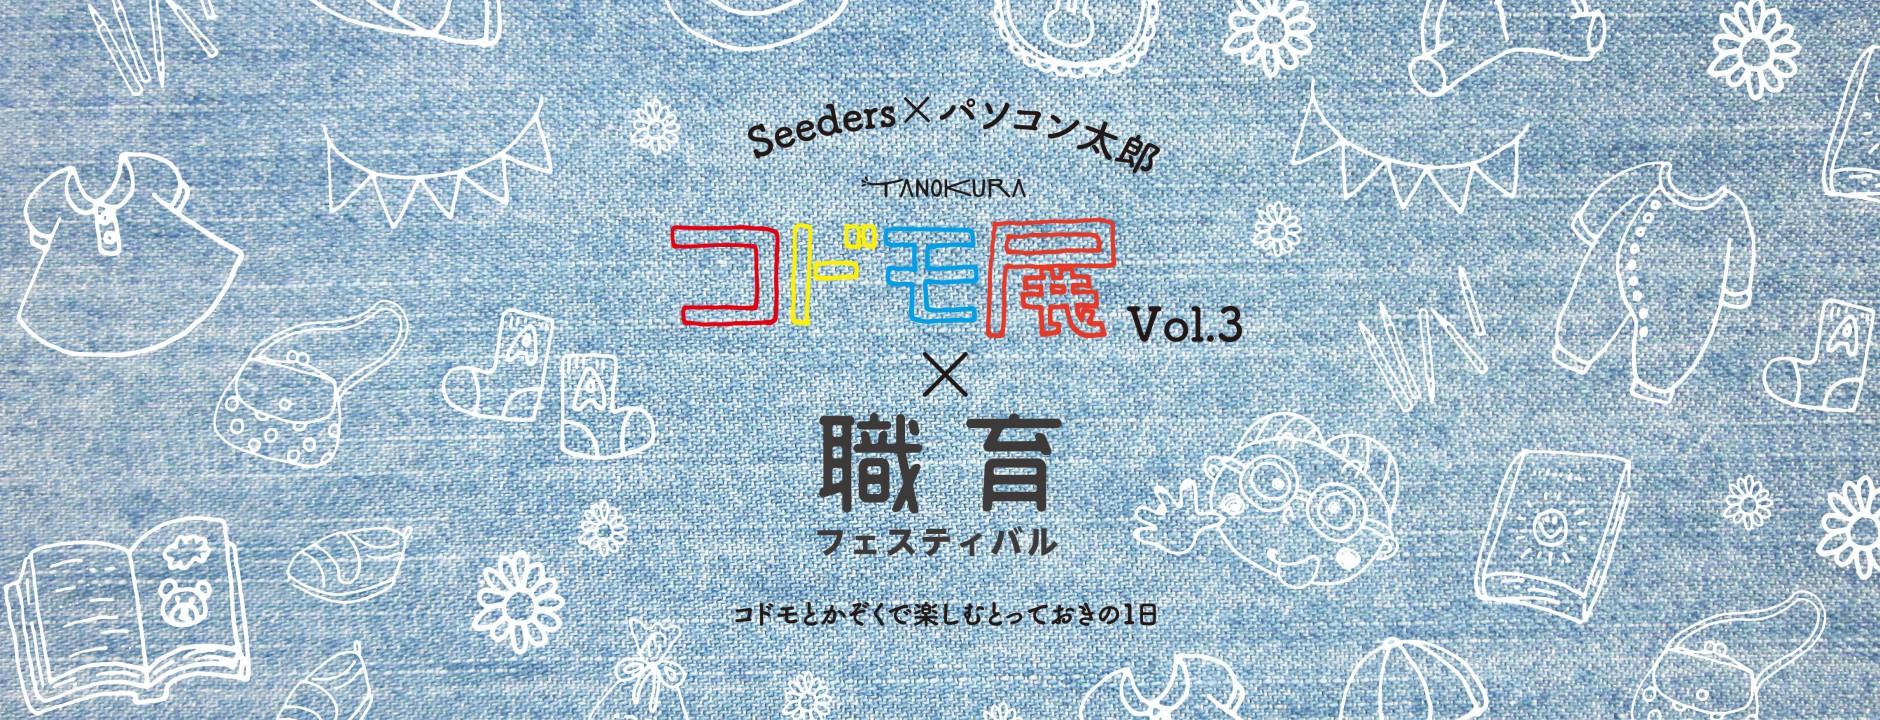 2019/8/25 TANOKURAコドモ展 Vol.3